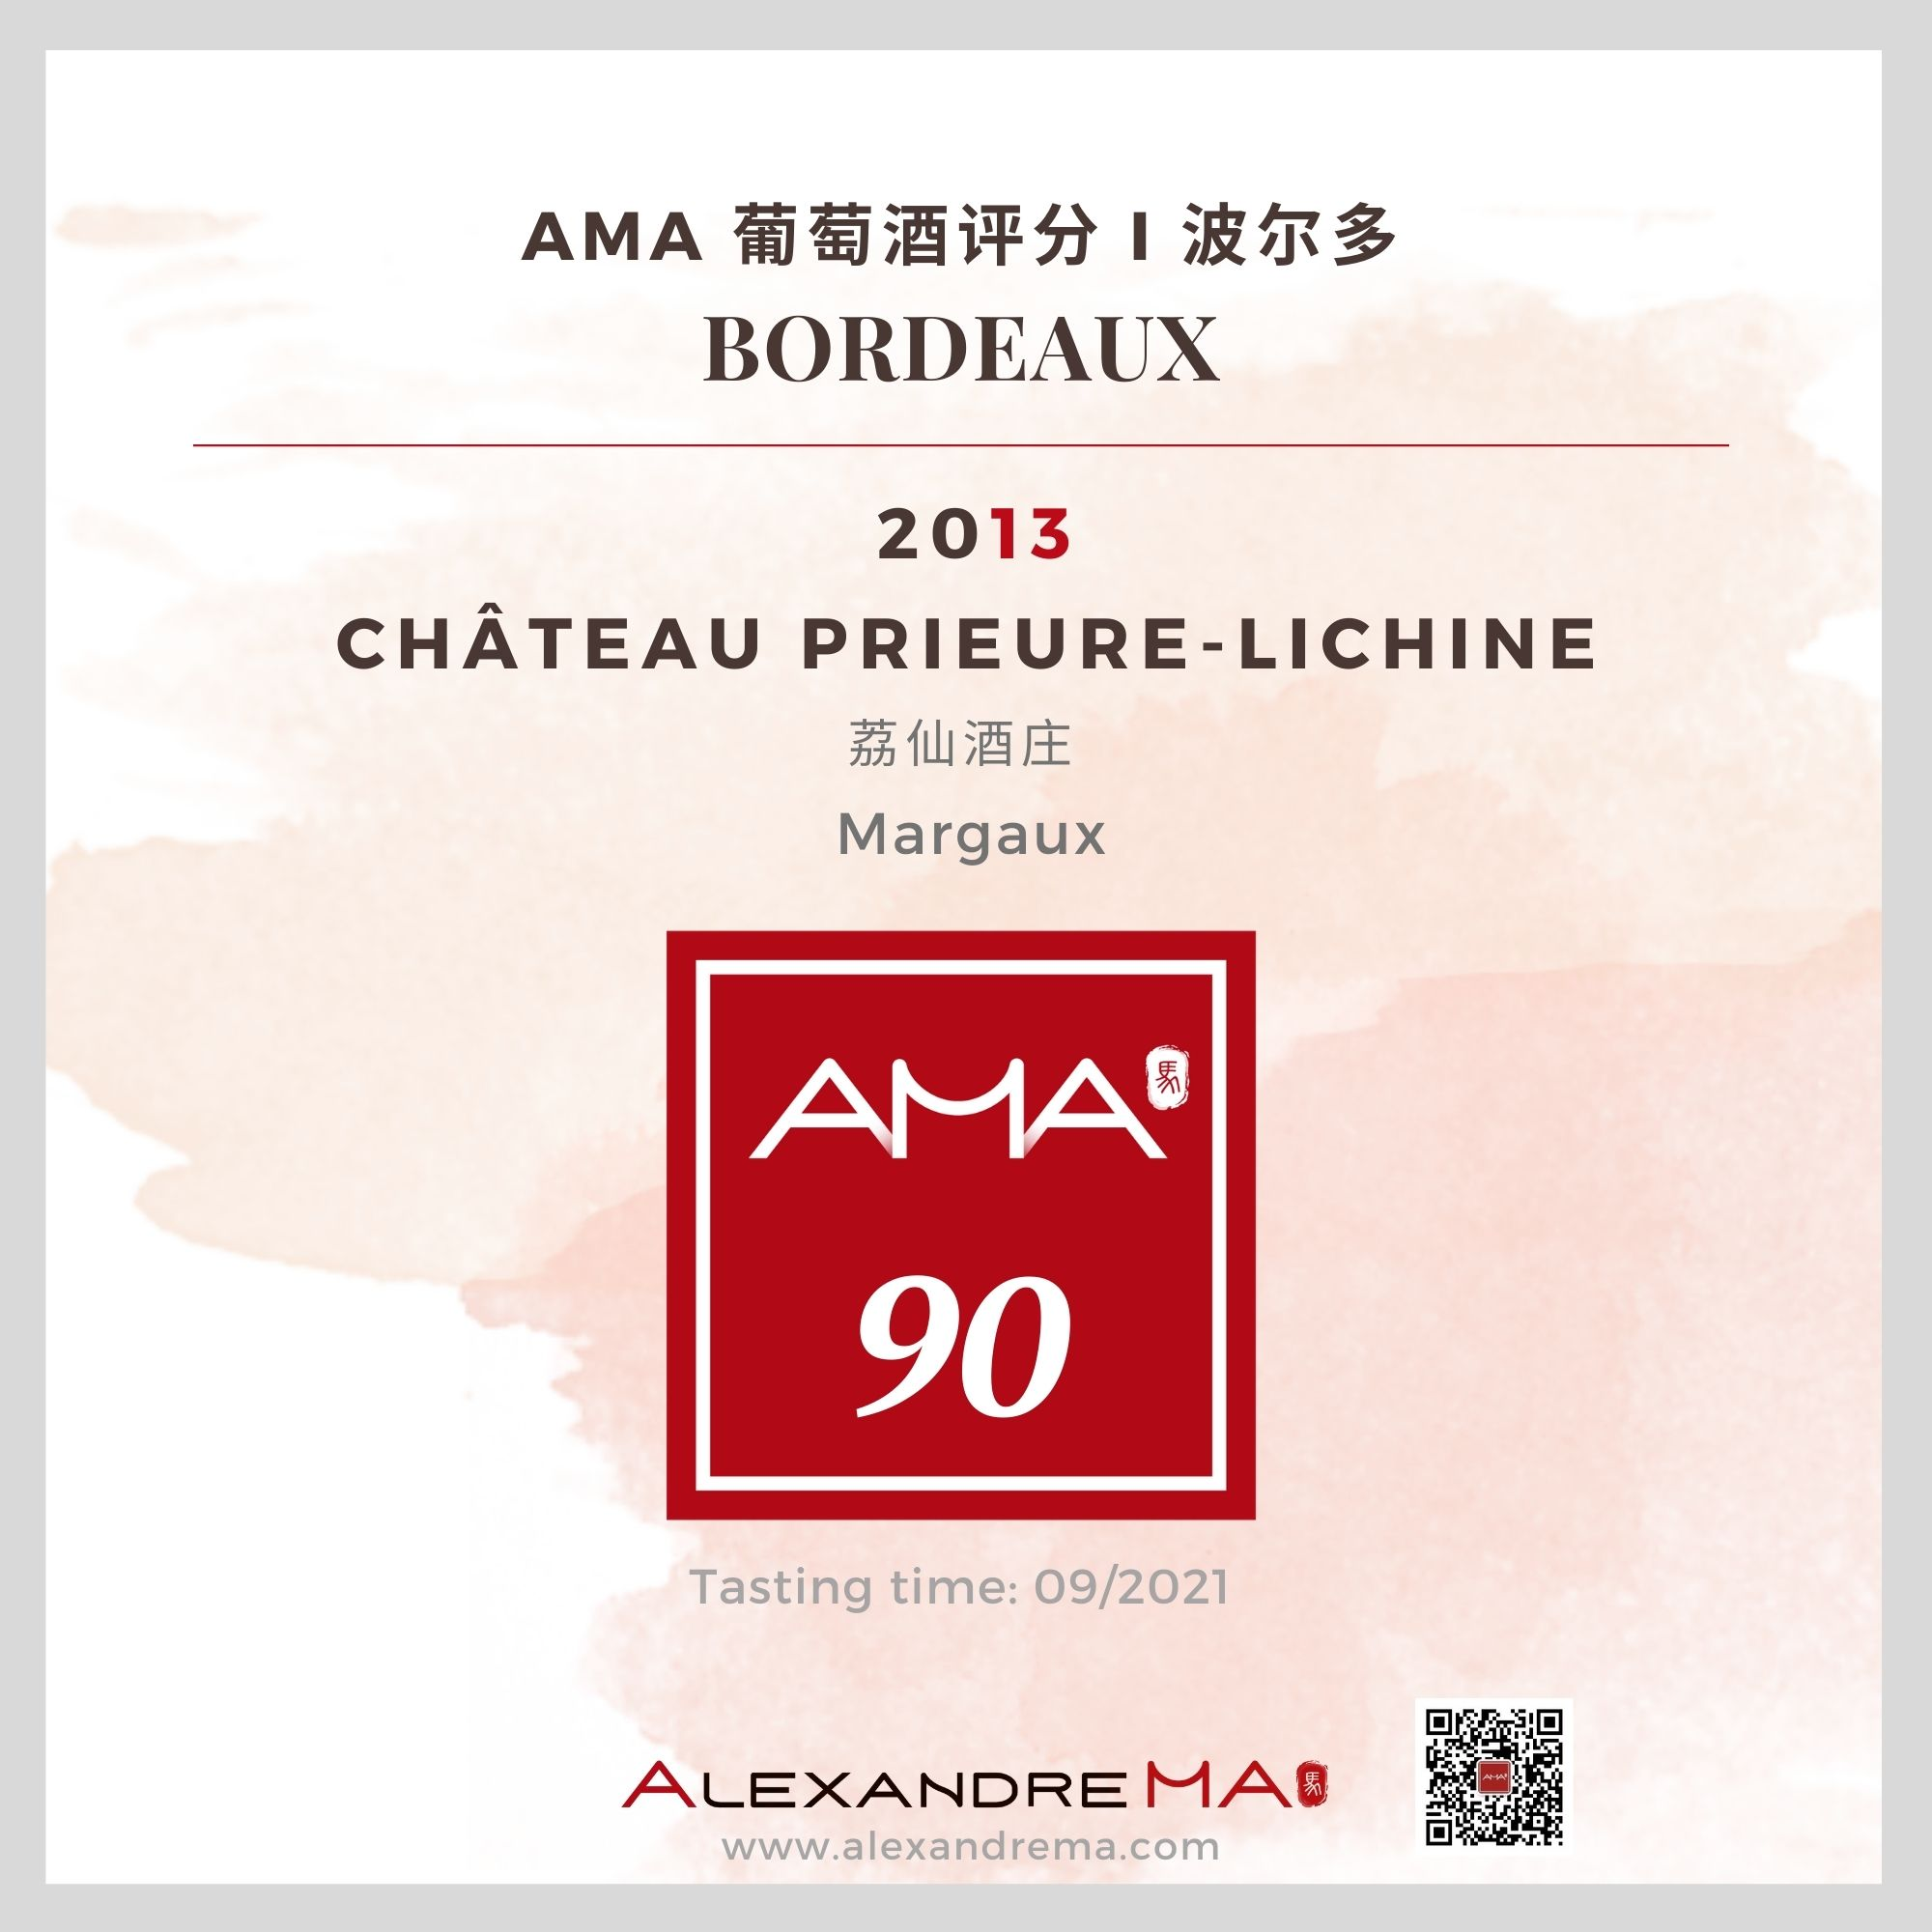 Château Prieuré-Lichine 2013 - Alexandre MA